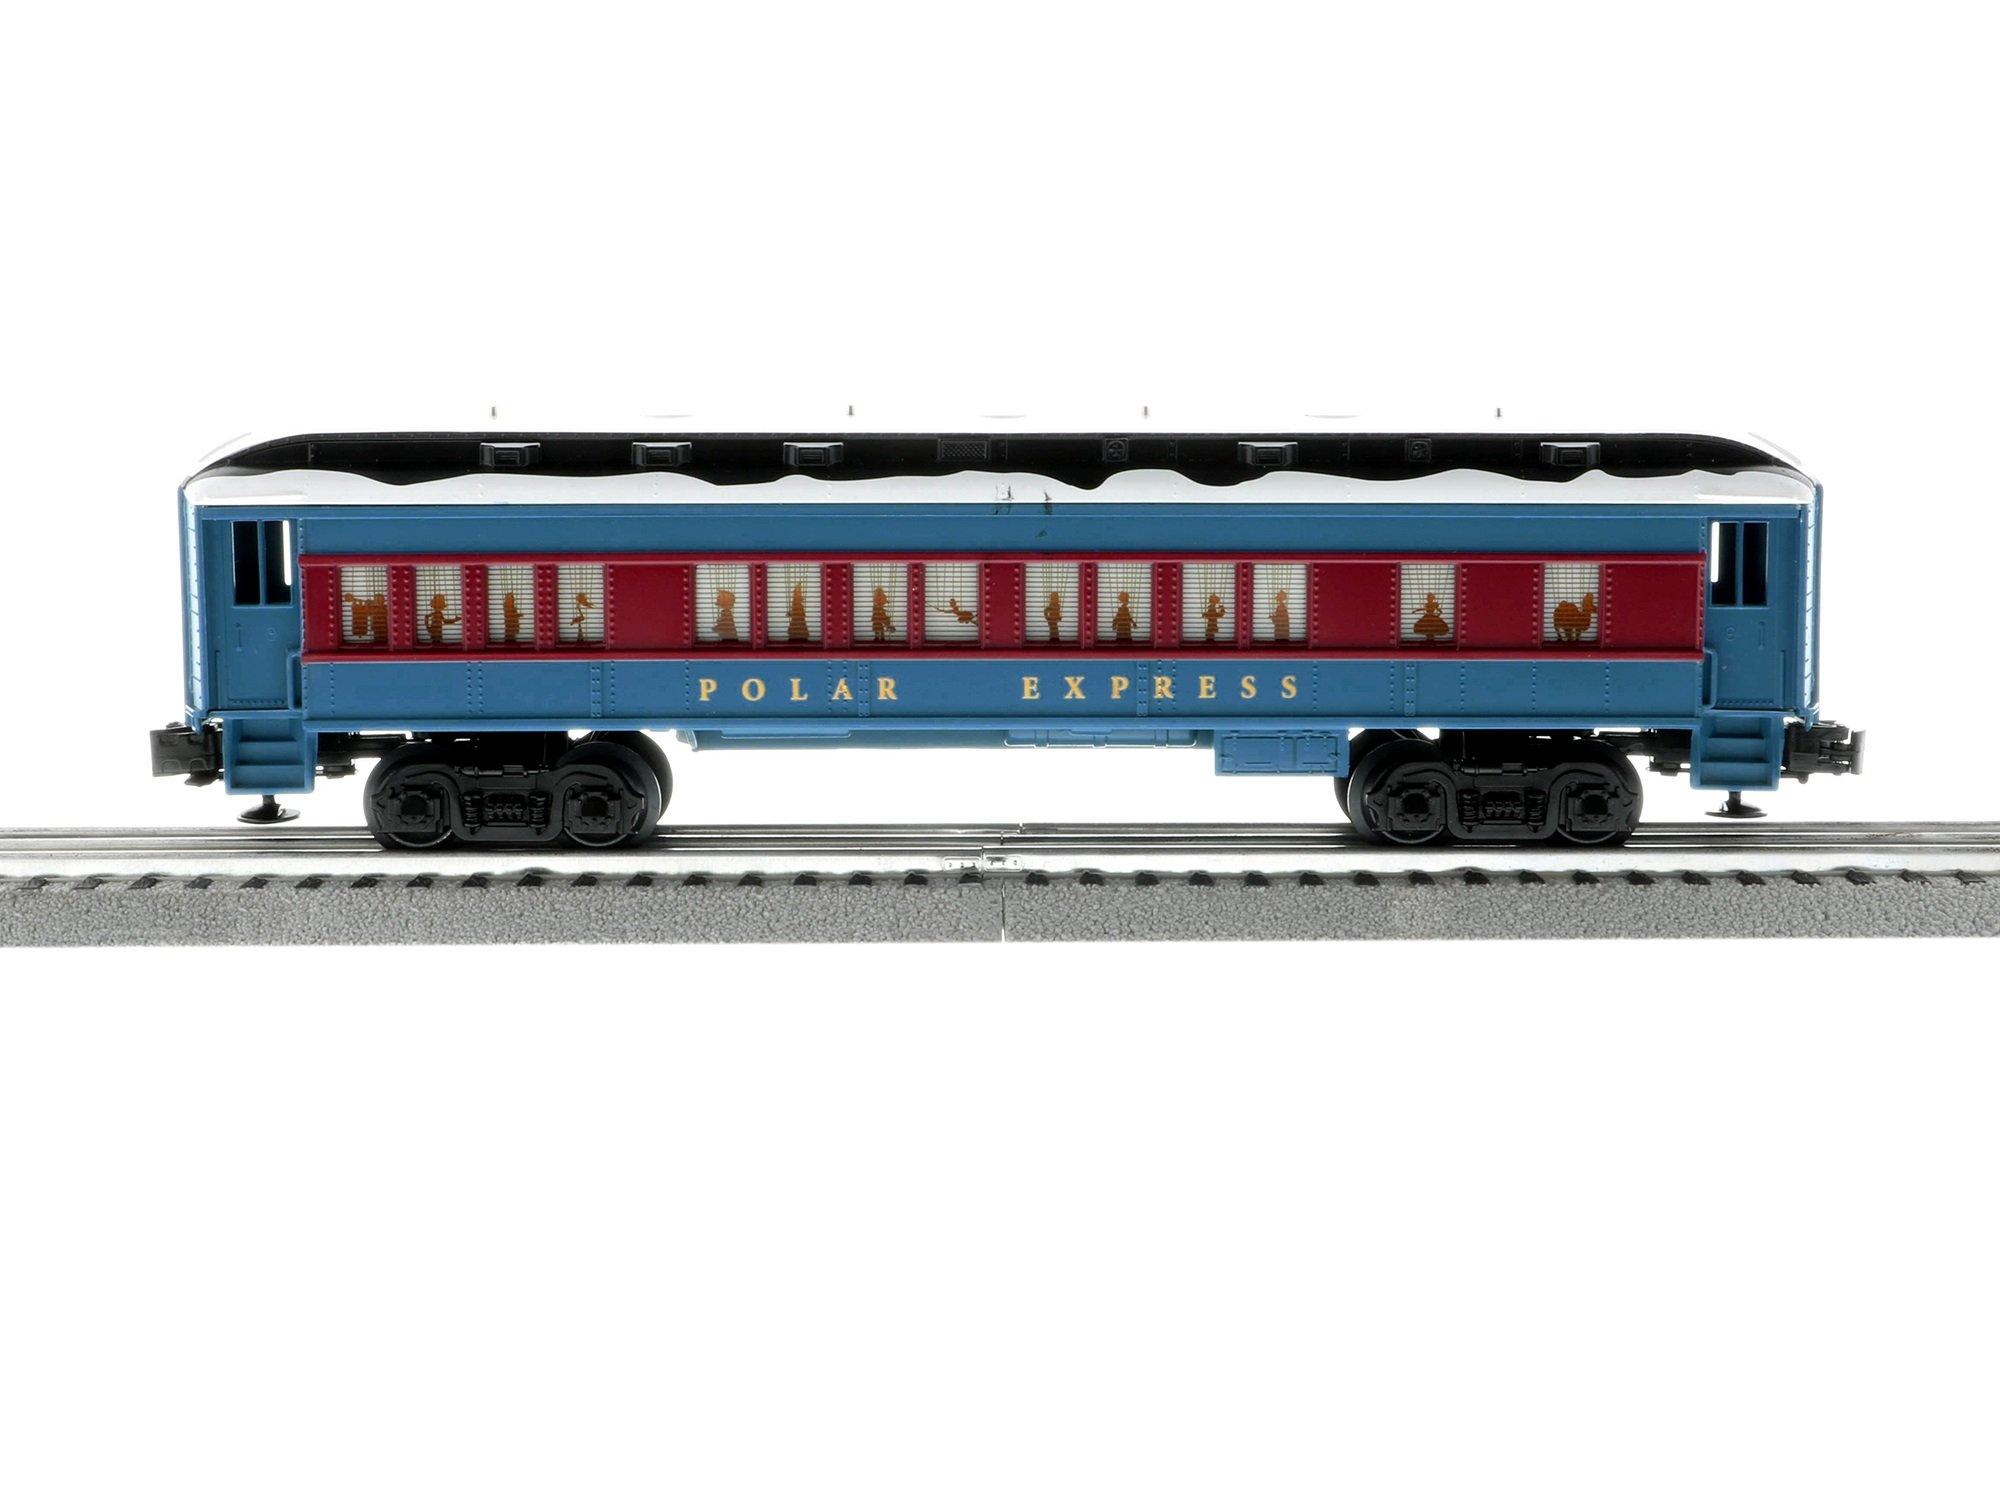 Lionel The Polar Express LionChief Train Set with Bluetooth Train Set by Lionel (Image #11)